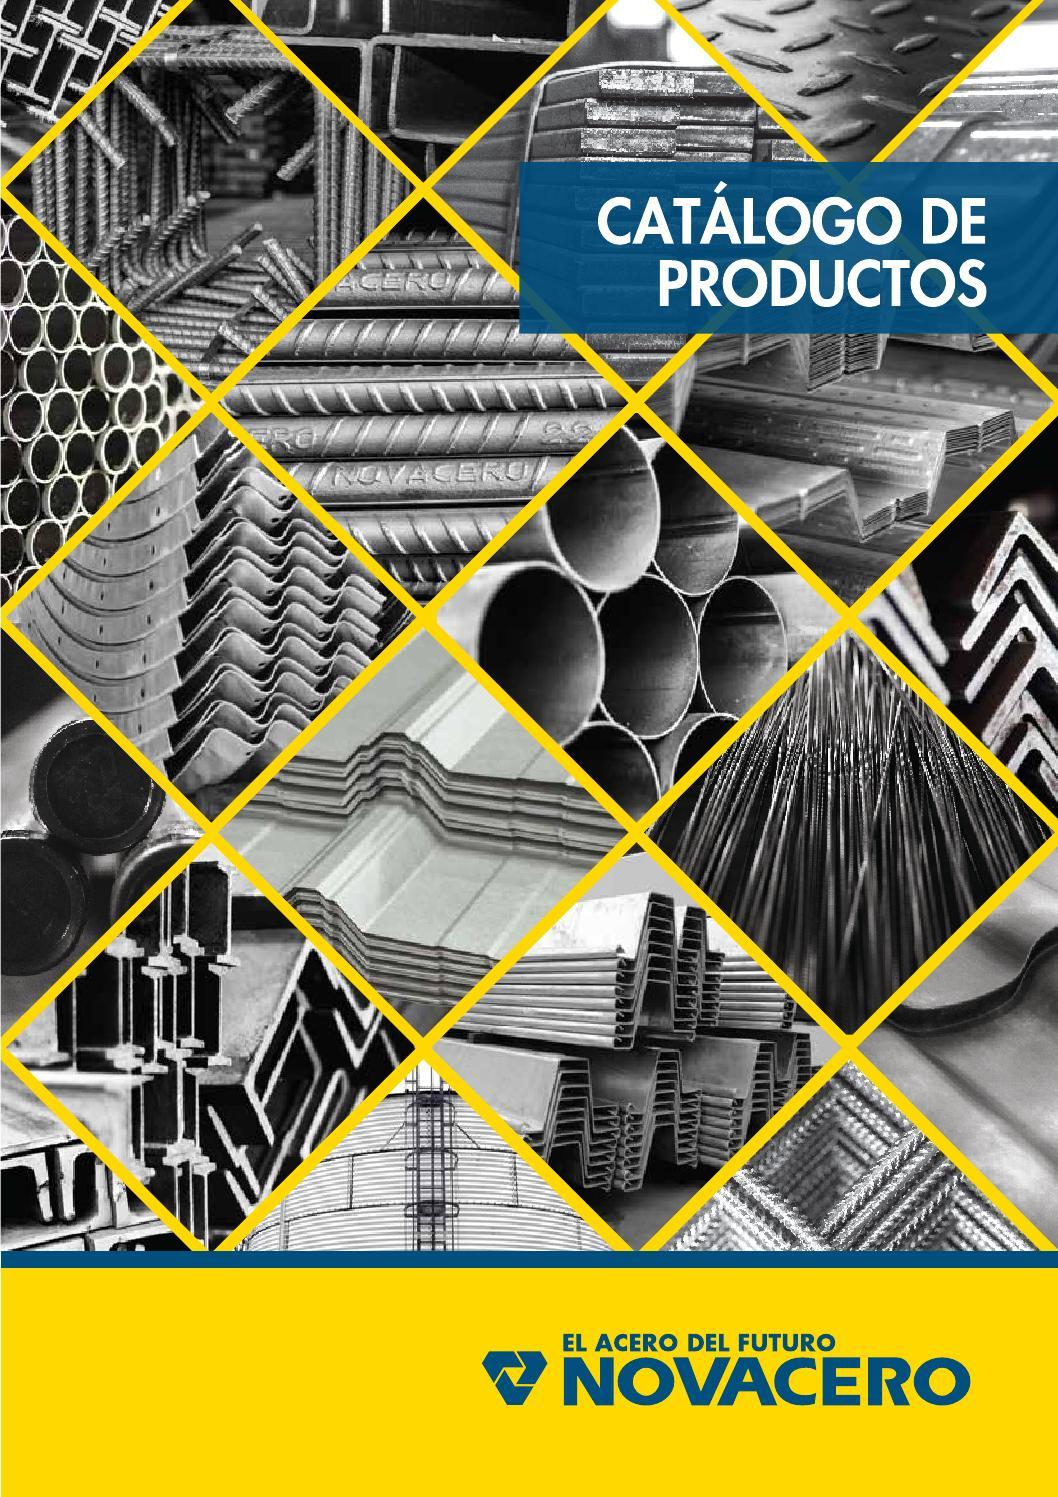 Catalogo 2015 productos novacero by AACONSULTING CIA LTDA - issuu